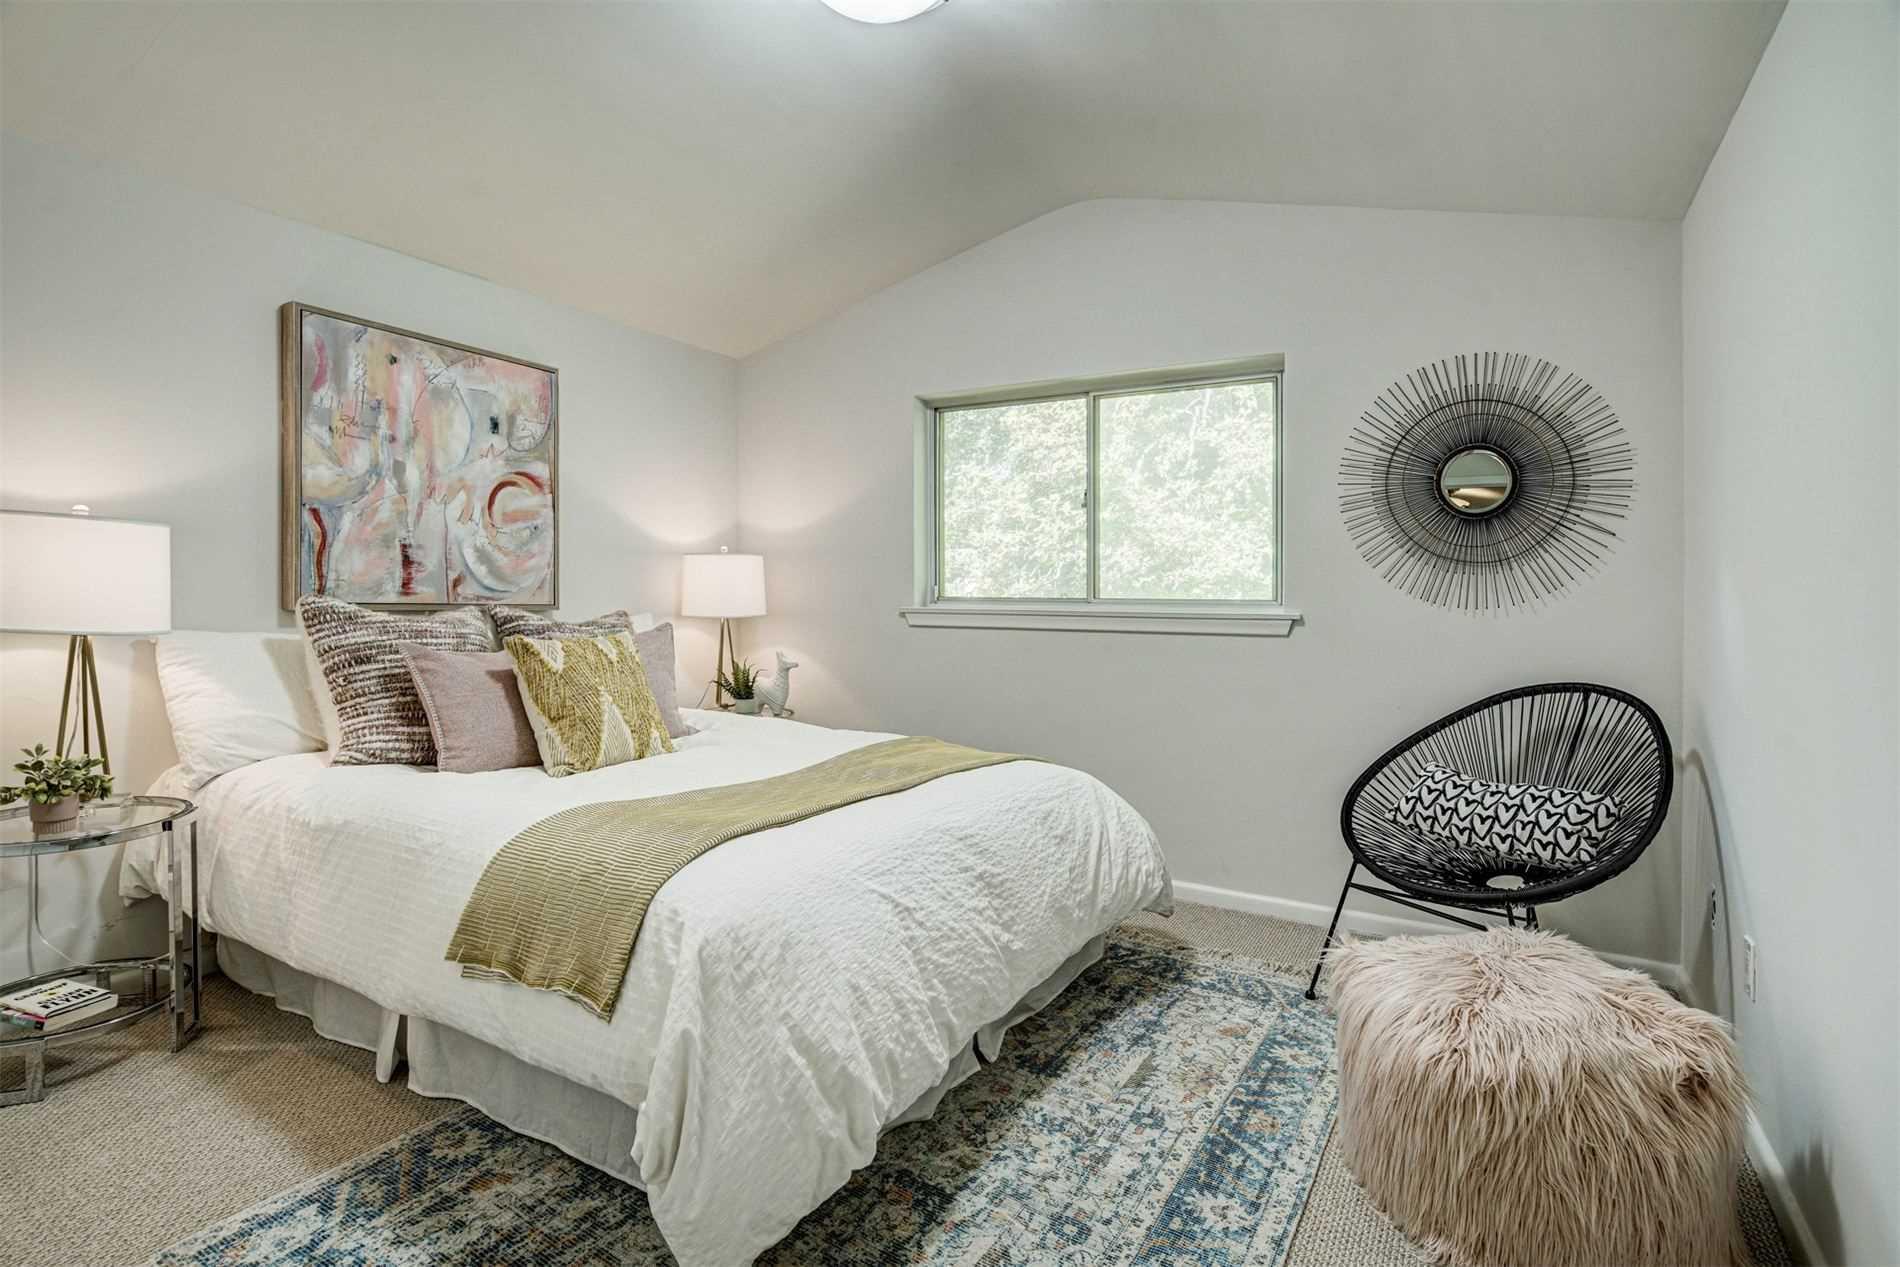 140 Verobeach Blvd - Humbermede Detached for sale, 3 Bedrooms (W5385046) - #16